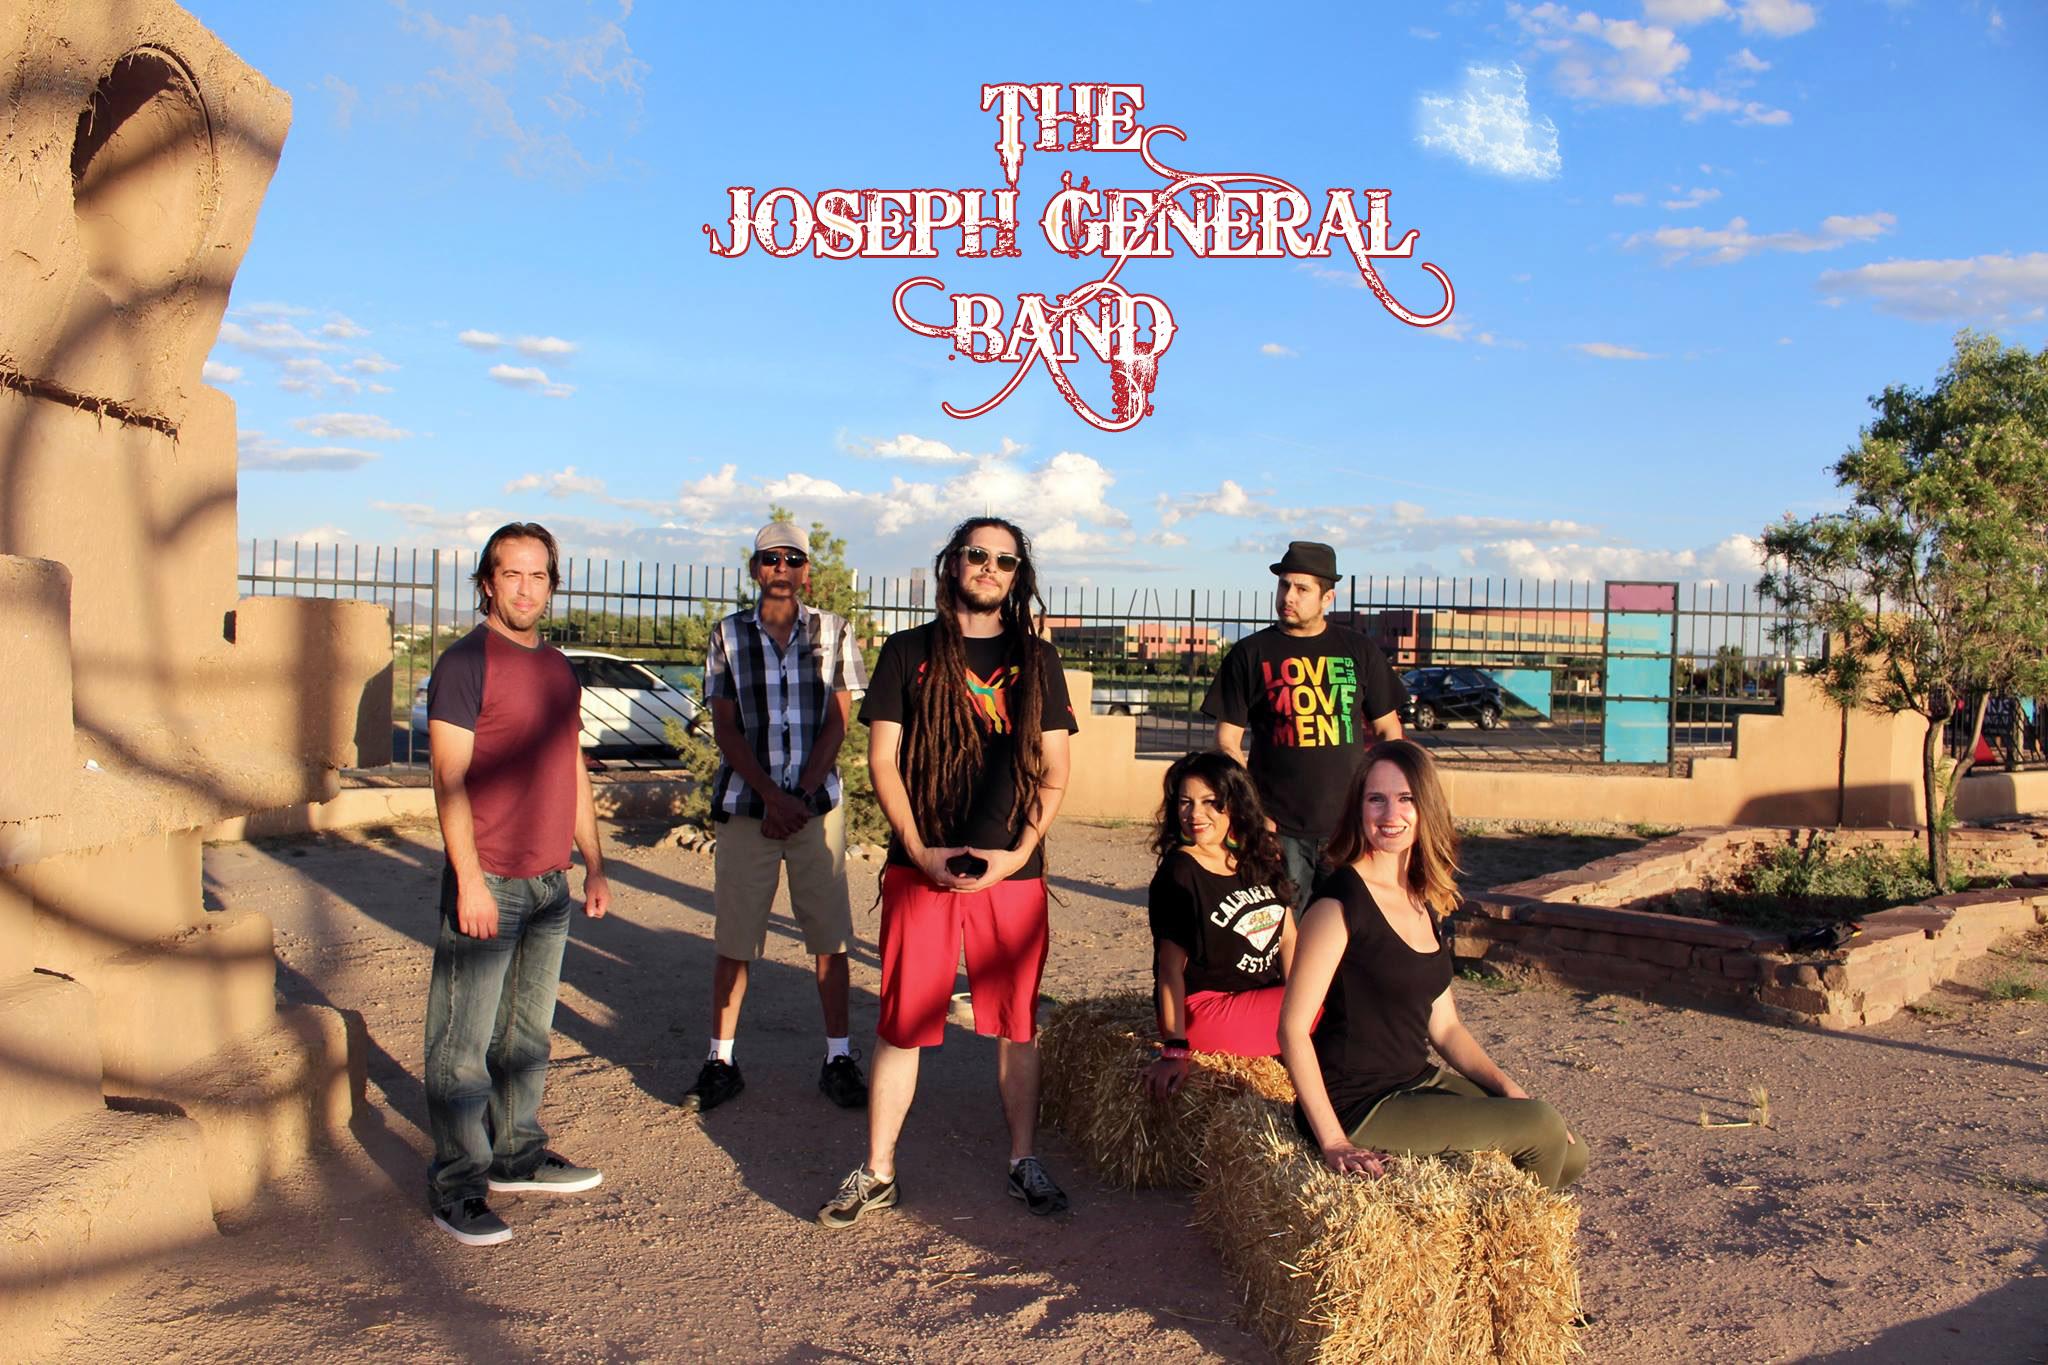 The Joseph General Band 2017